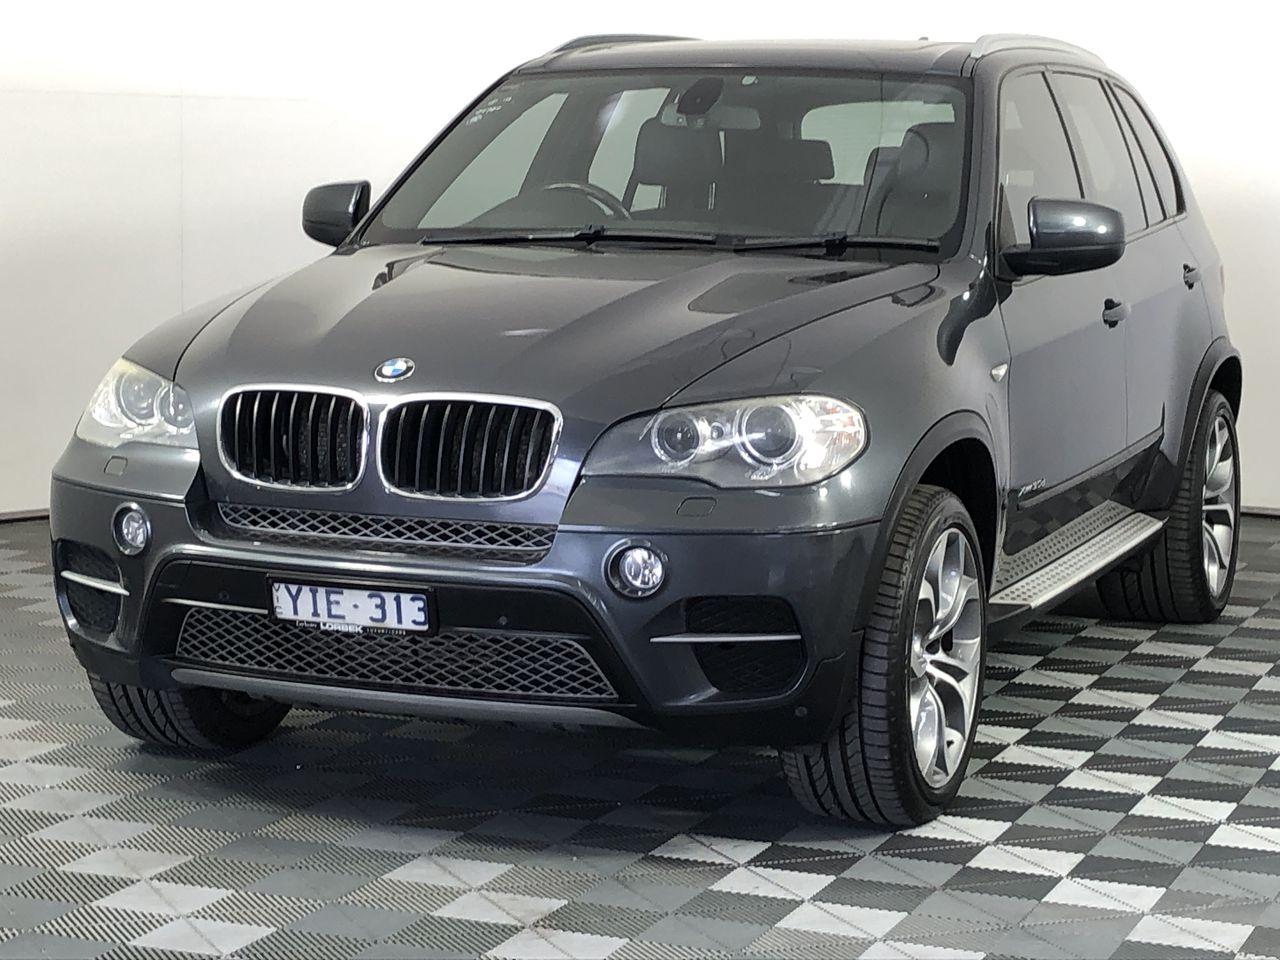 2011 BMW X5 xDrive 30d E70 LCI Turbo Diesel Automatic - 8 Speed Wagon